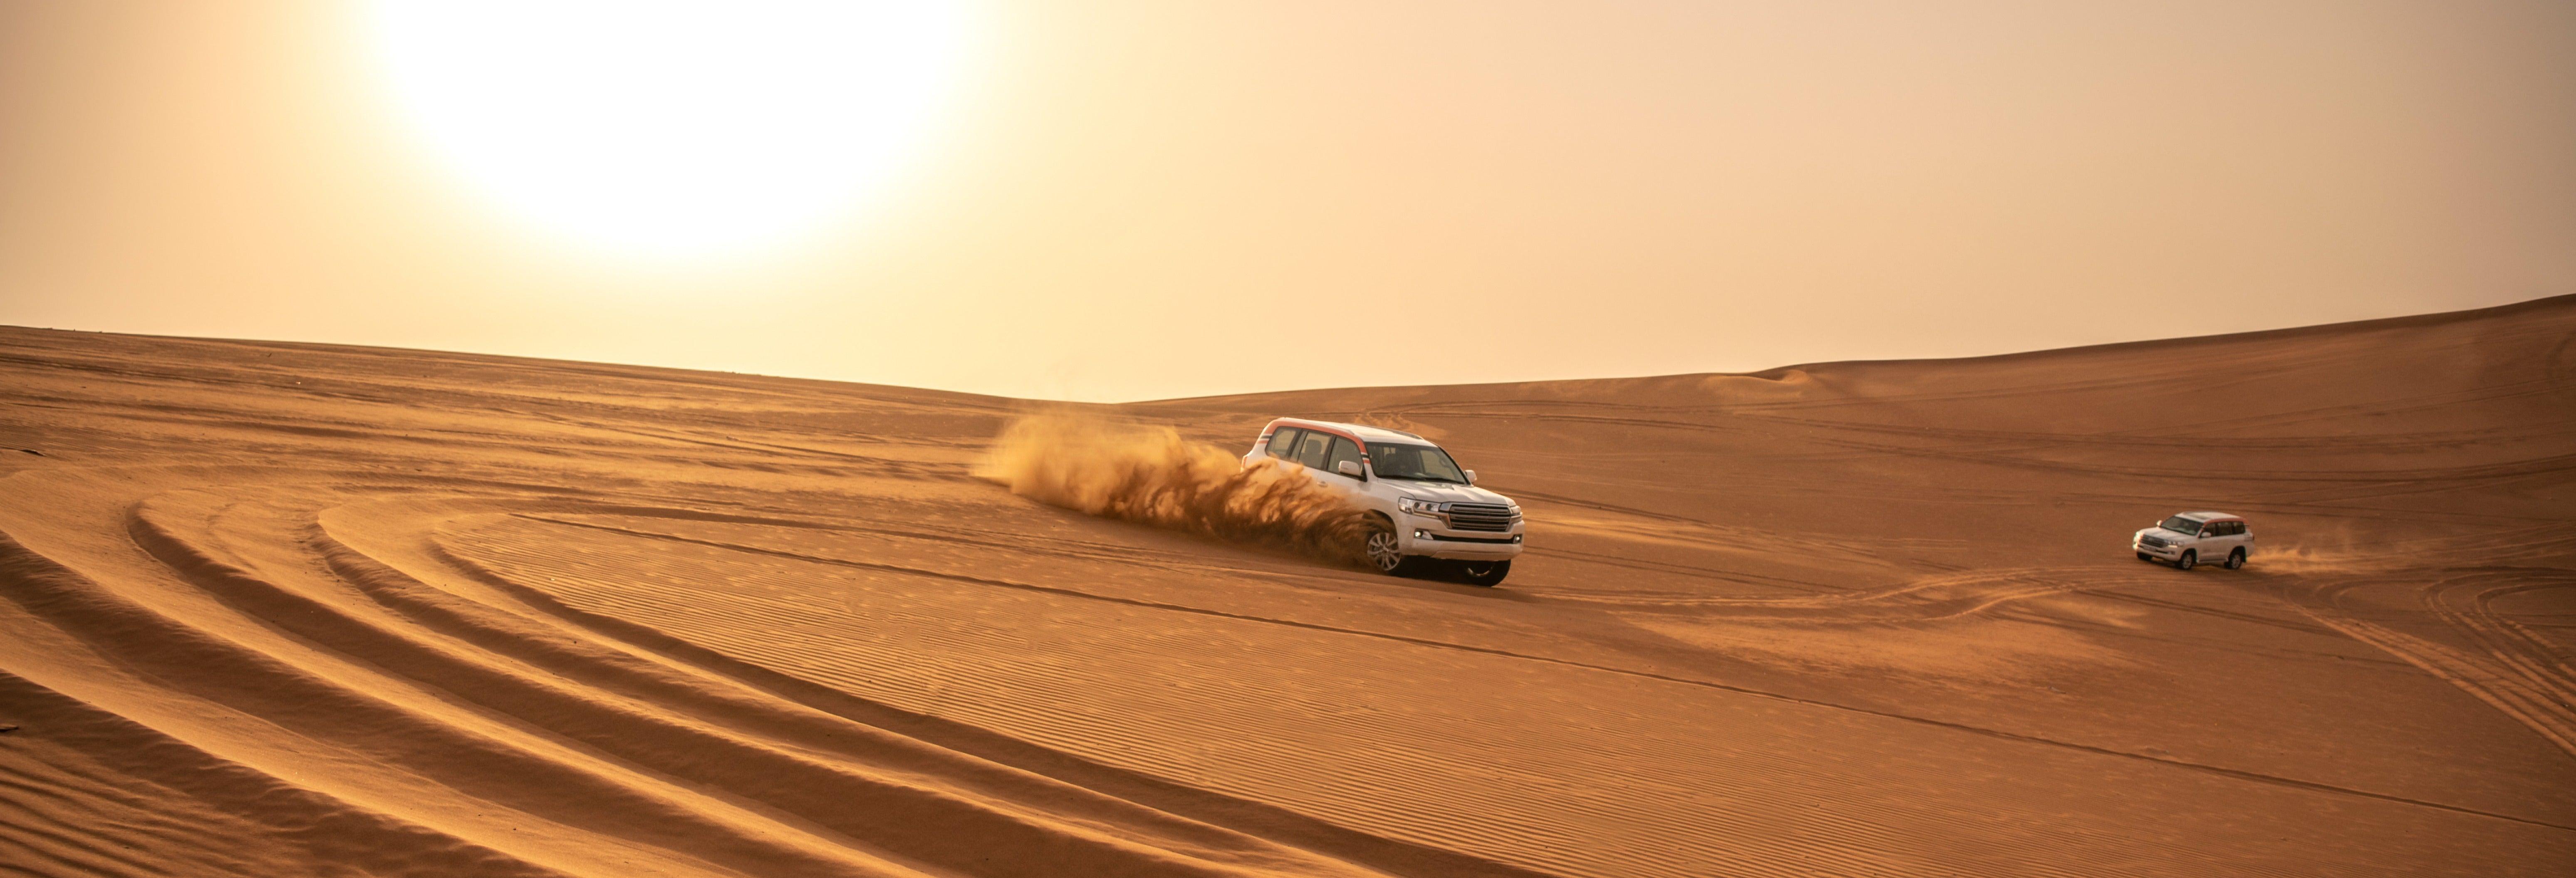 Dubai Overnight Desert Safari